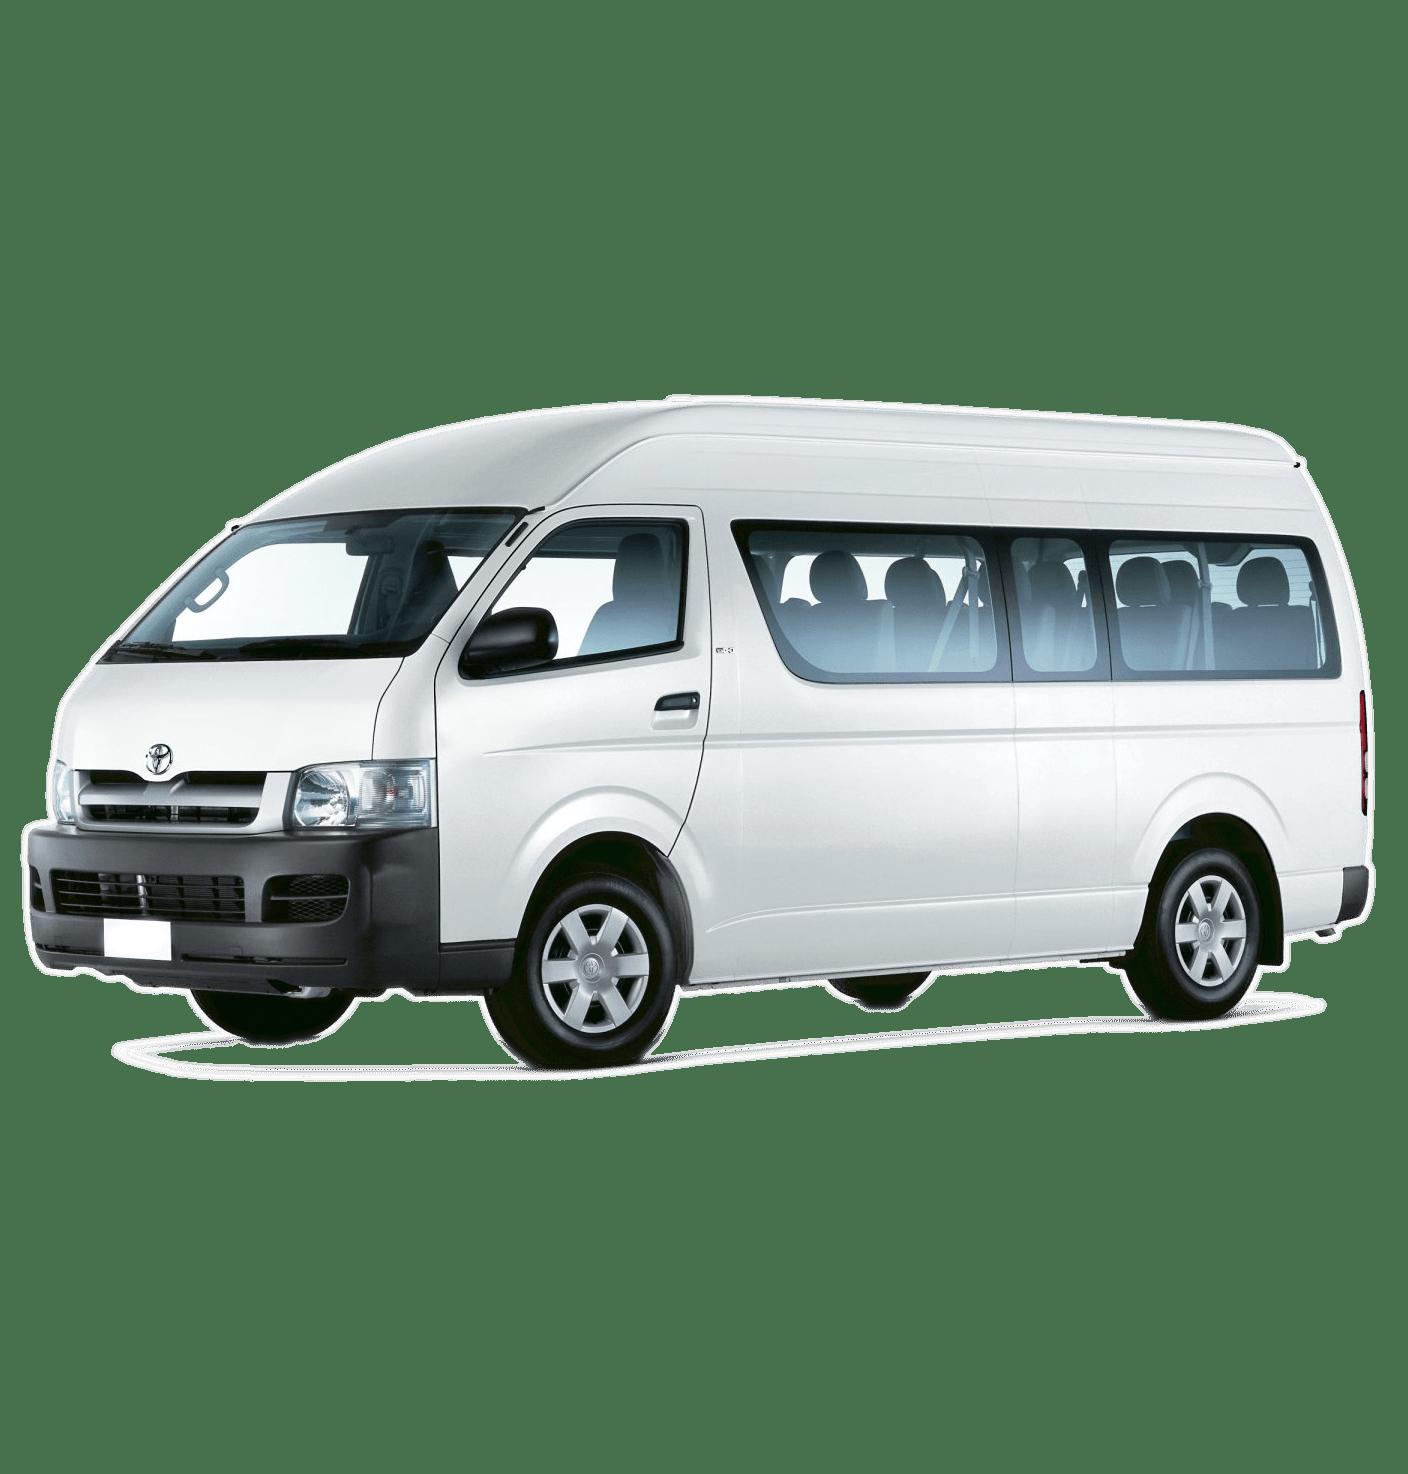 Toyota 12 Seat Mini Bus Hire Gold Coast Bring The